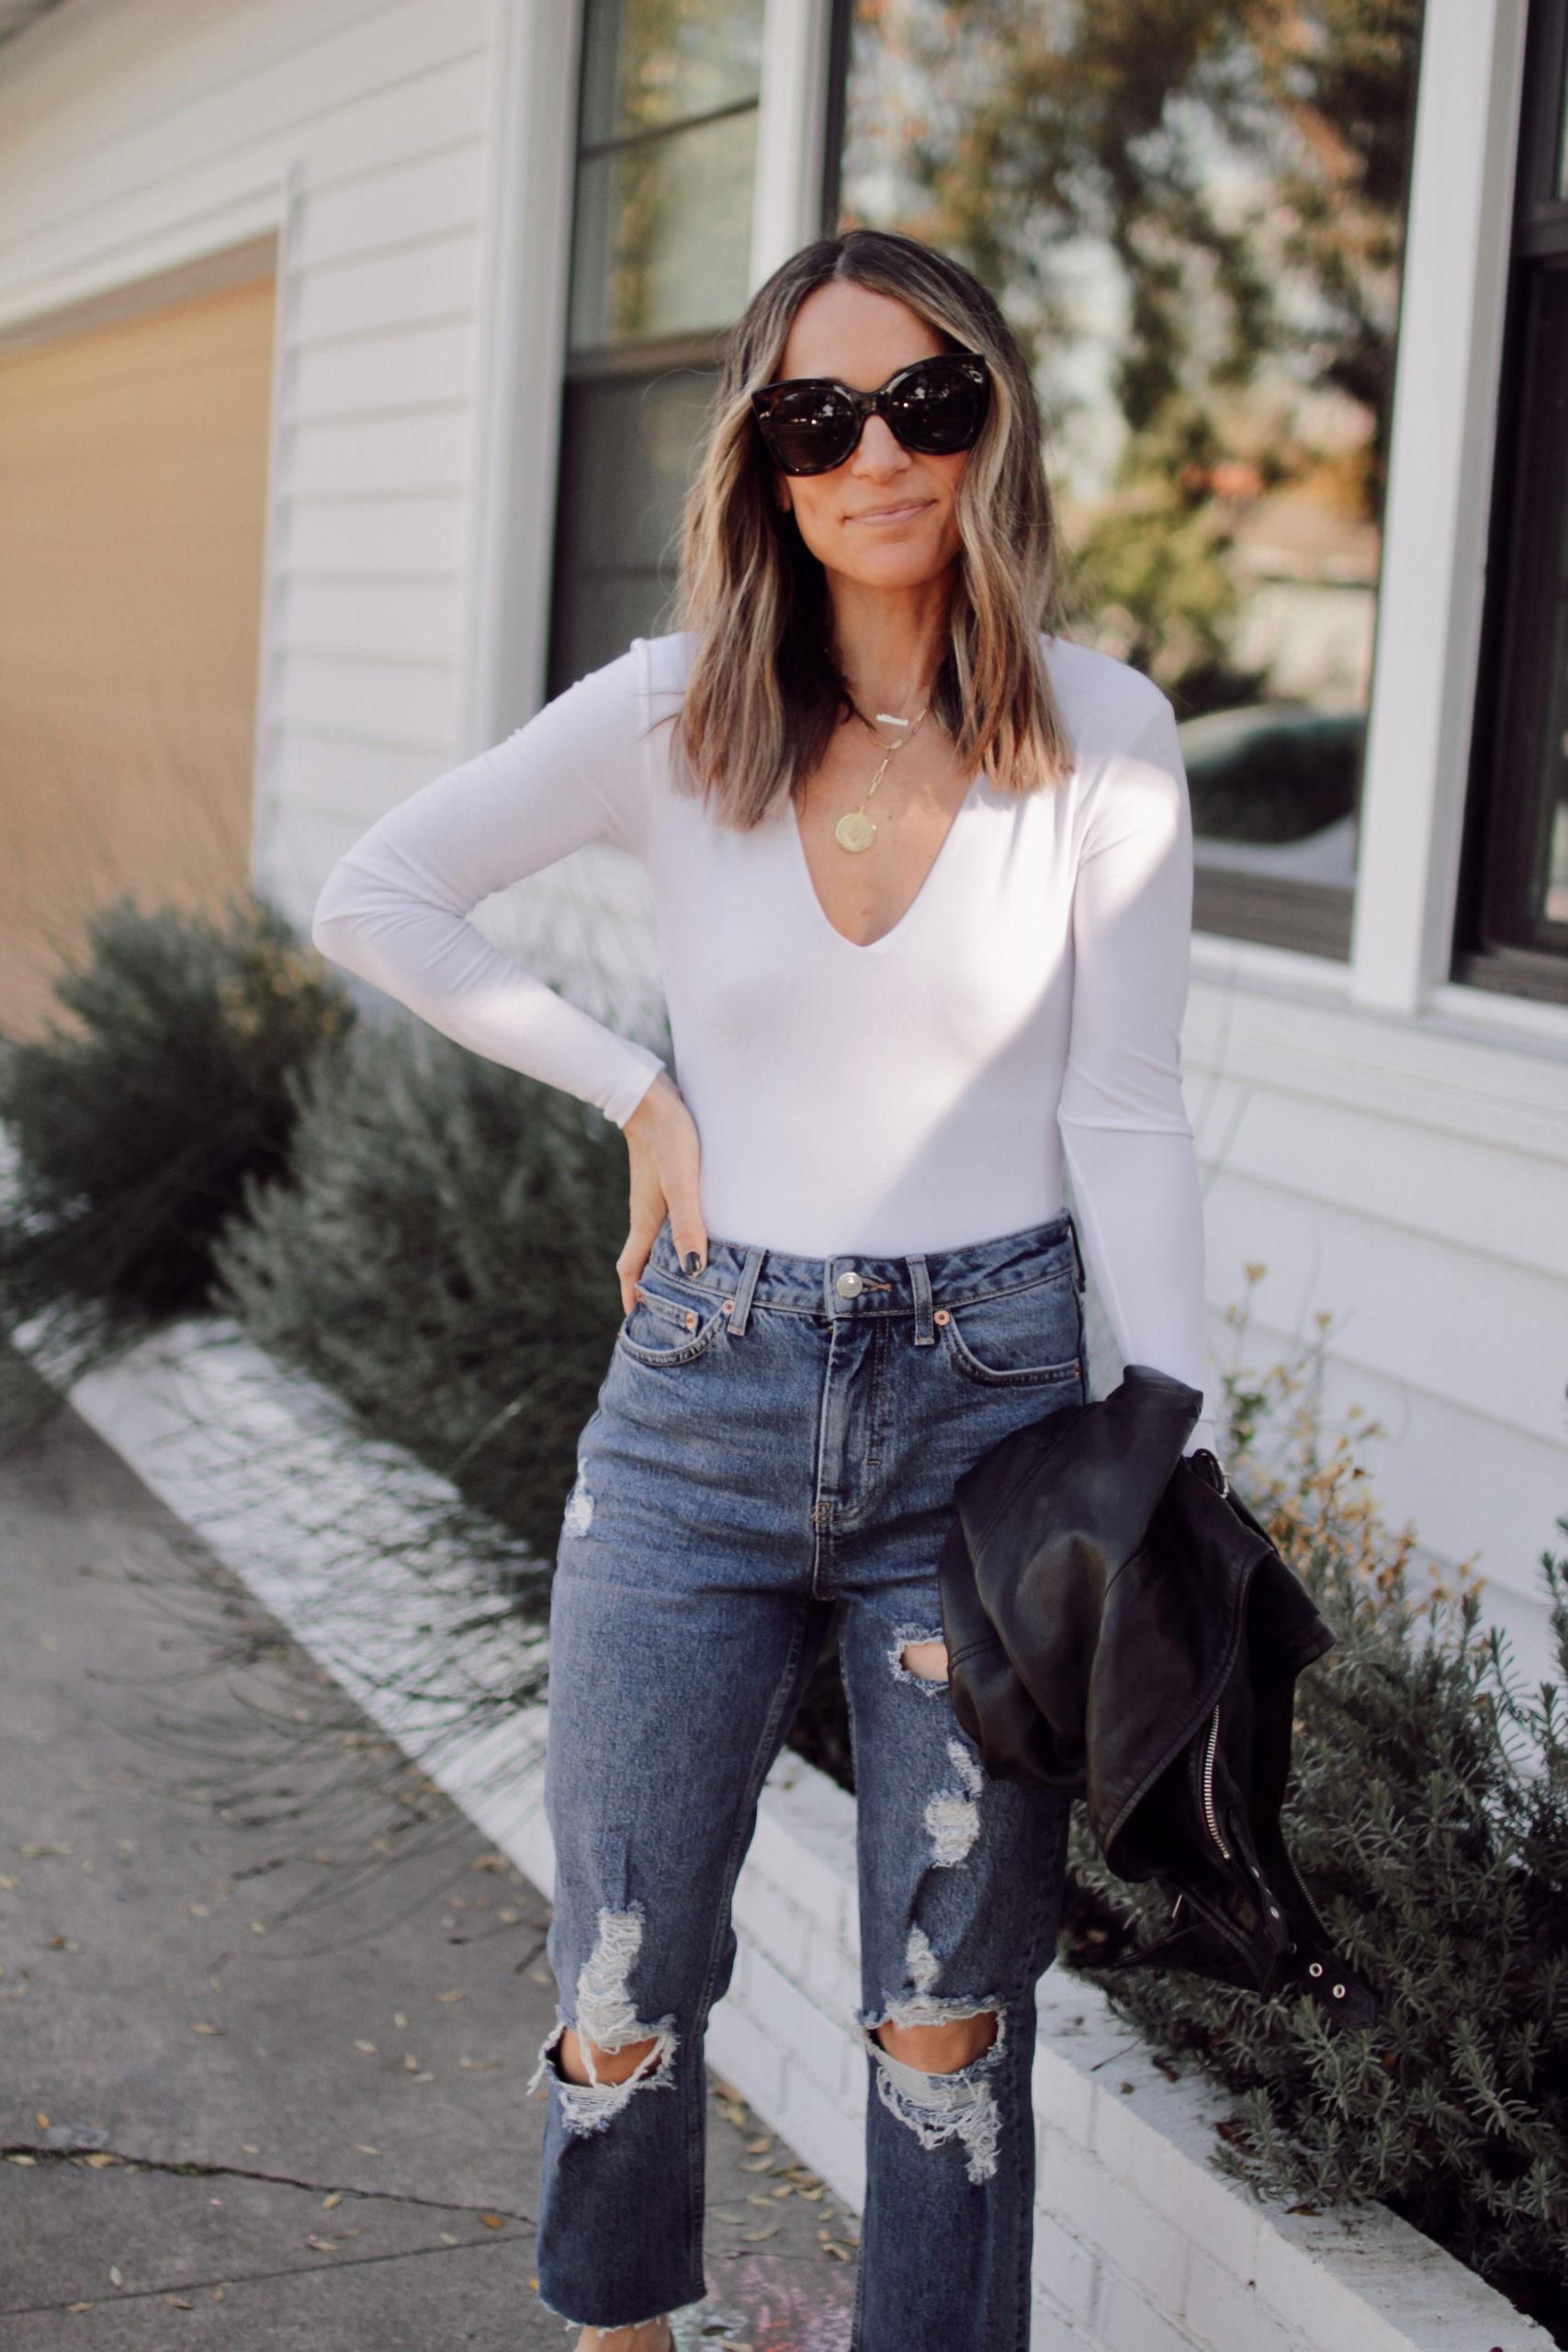 Everyday Style || The White Bodysuit 4 Ways